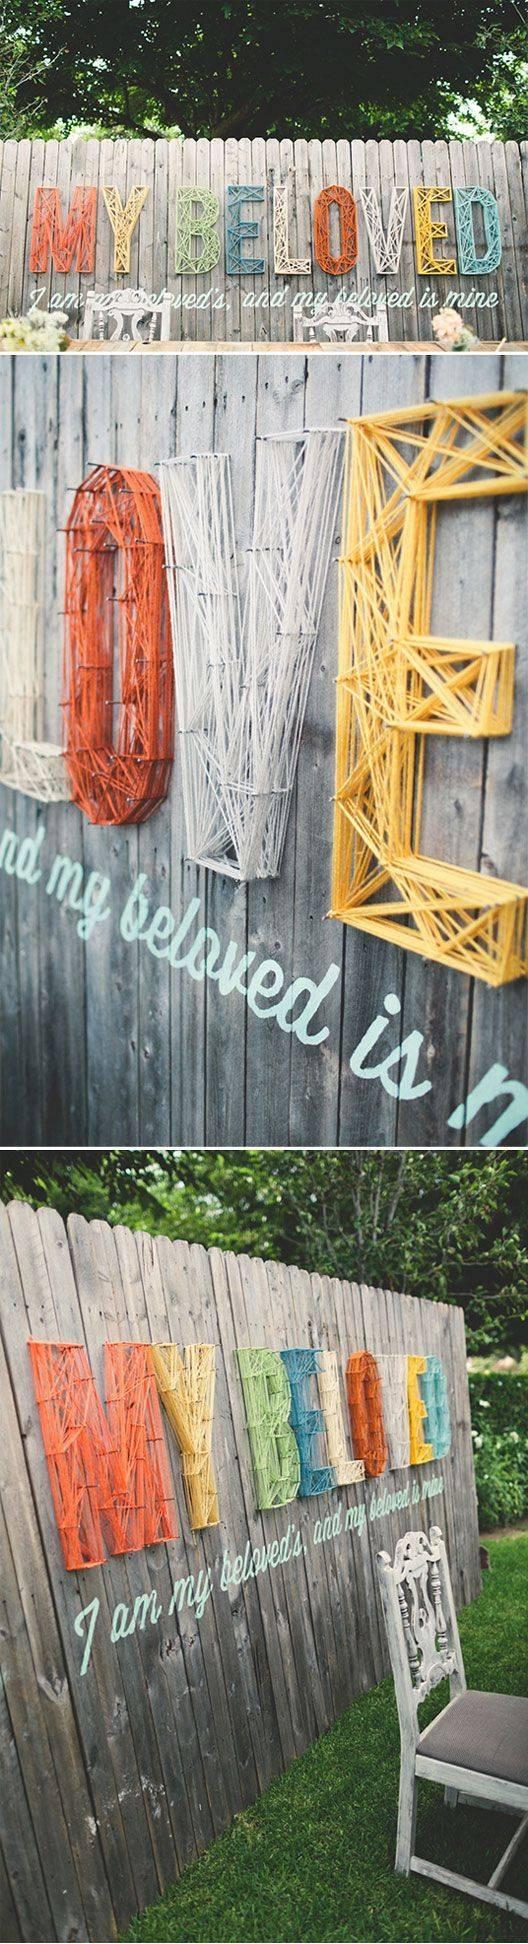 Incredible Diy Garden Fence Wall Art Ideas With Current Diy Garden Wall Art (View 8 of 25)